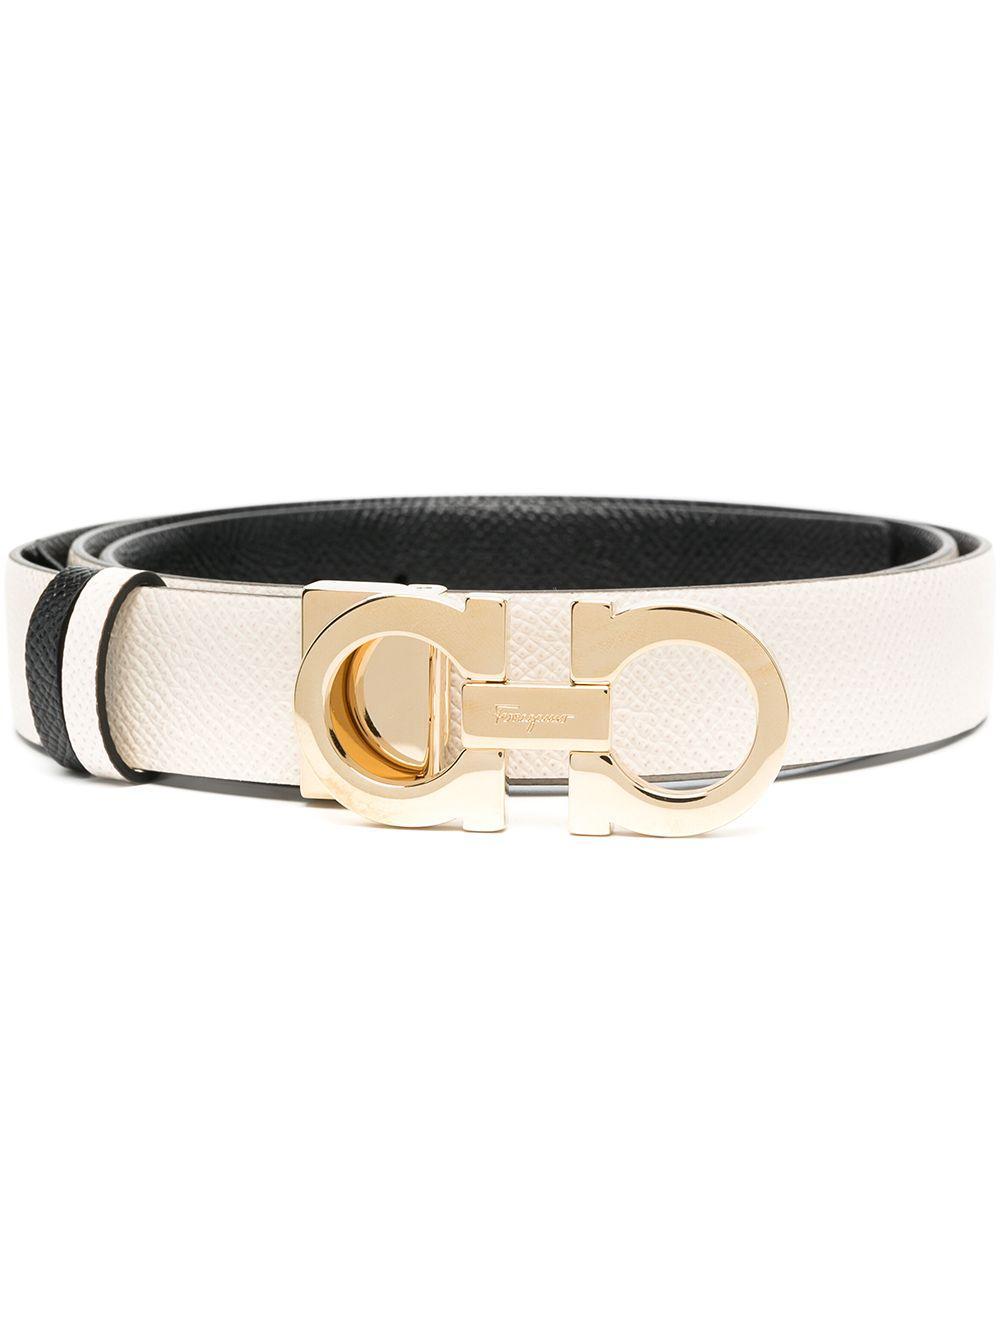 Picture of Ferragamo | Gancini Leather Belt